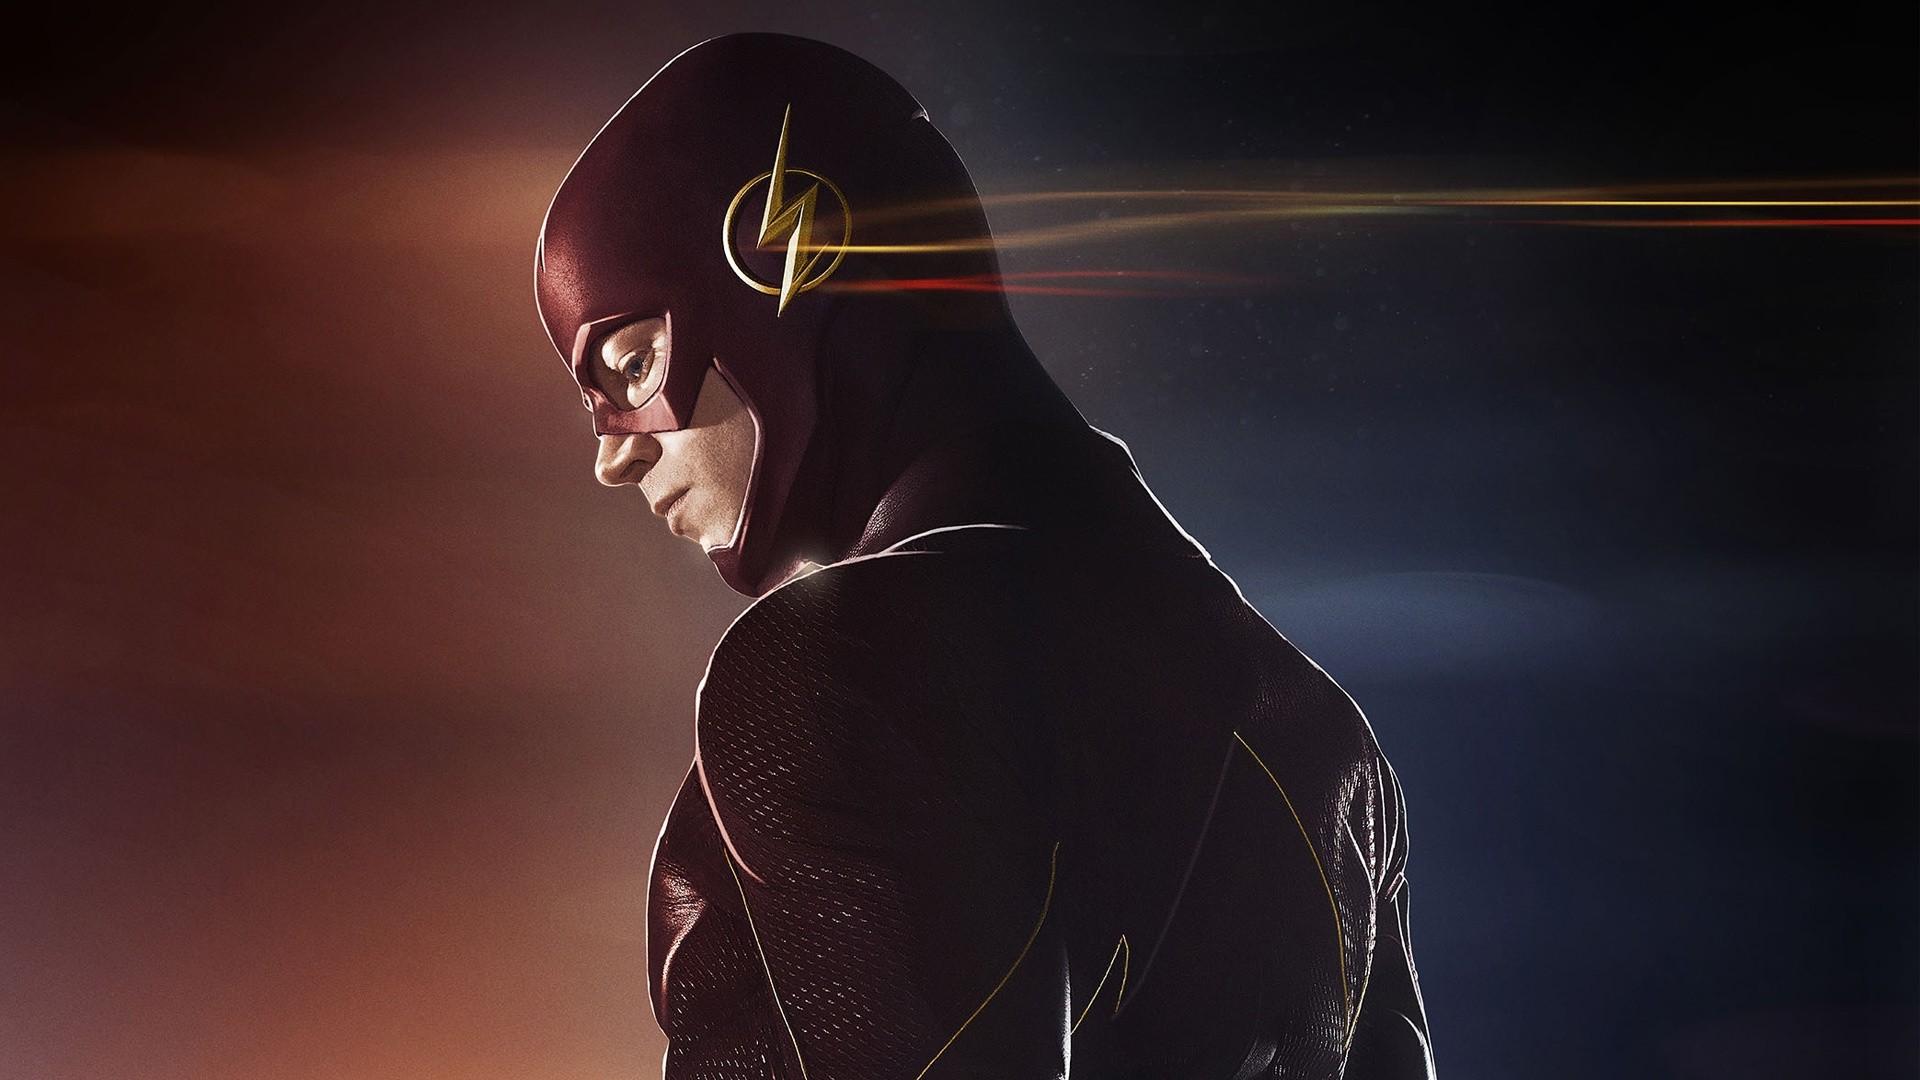 1920x1080 Px DC Comics Flash Superhero